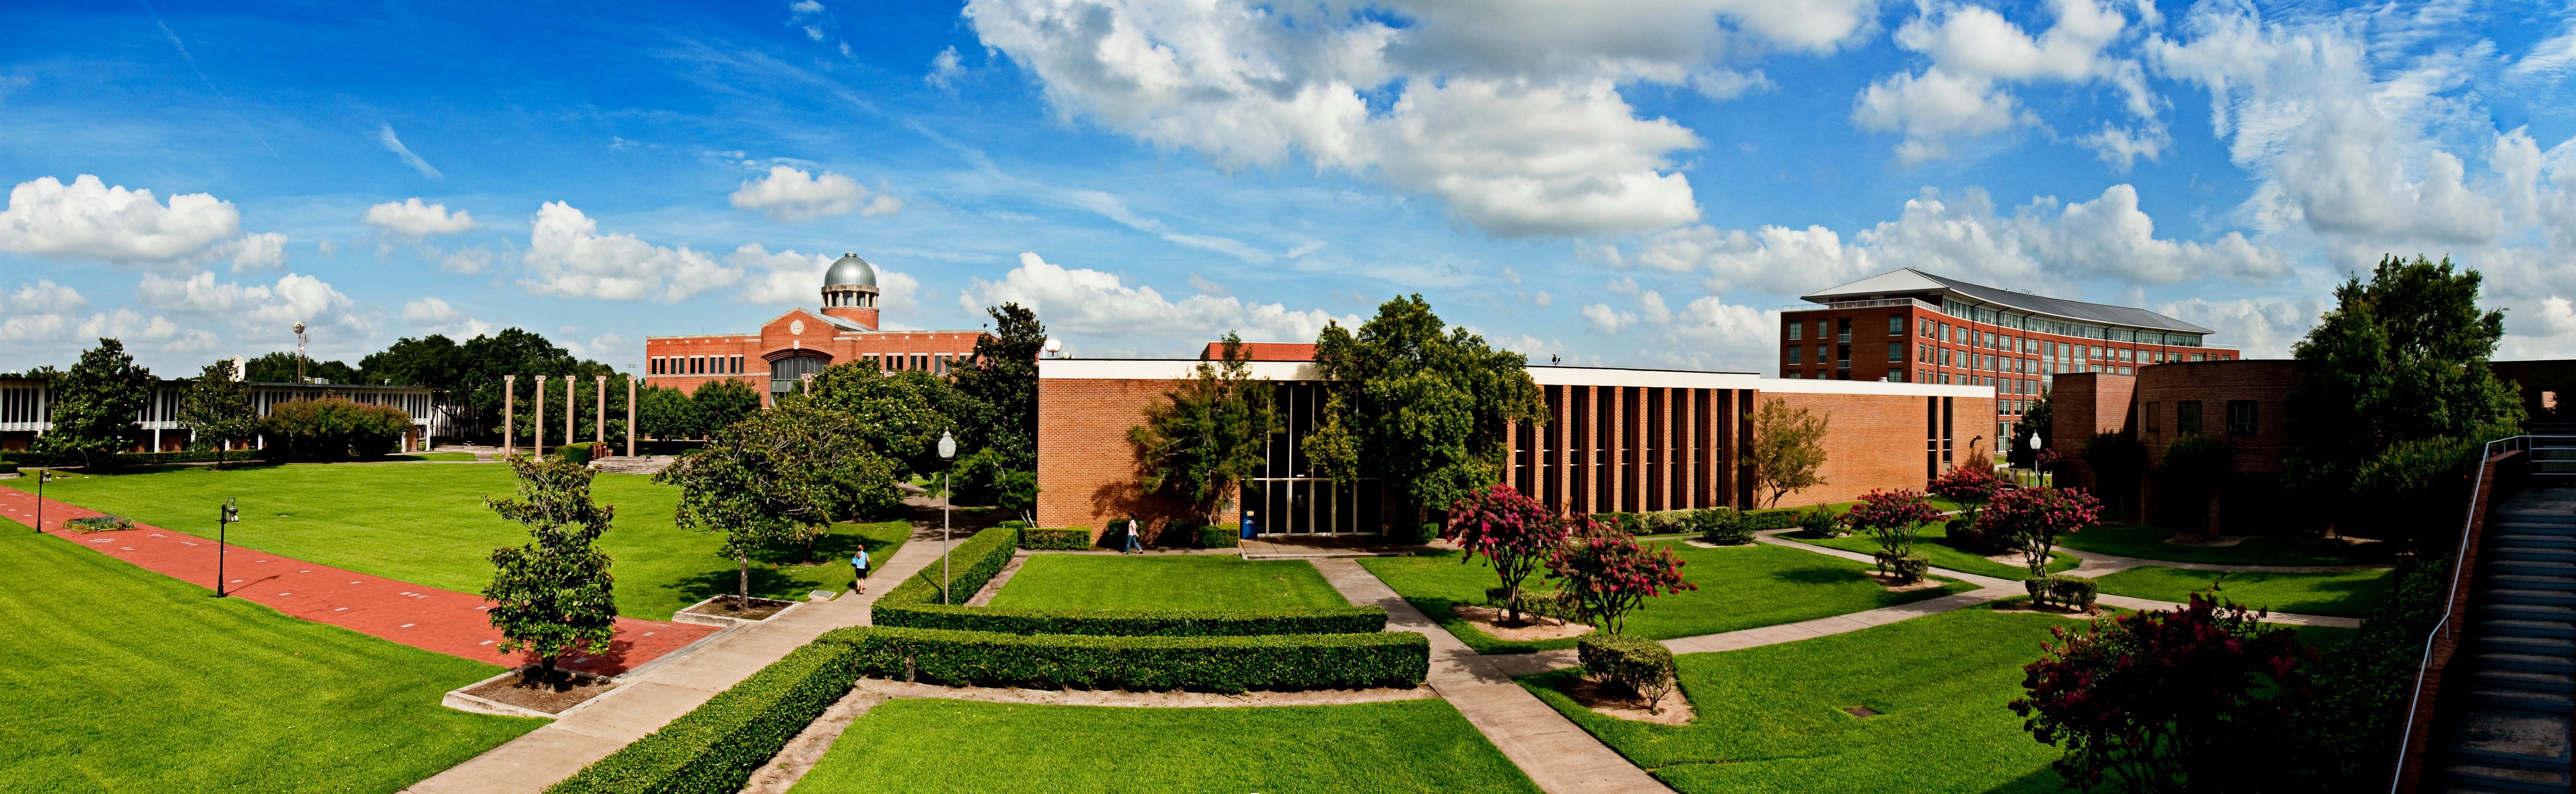 Houston_Baptist_Panorama_-_Wide_-1.jpg